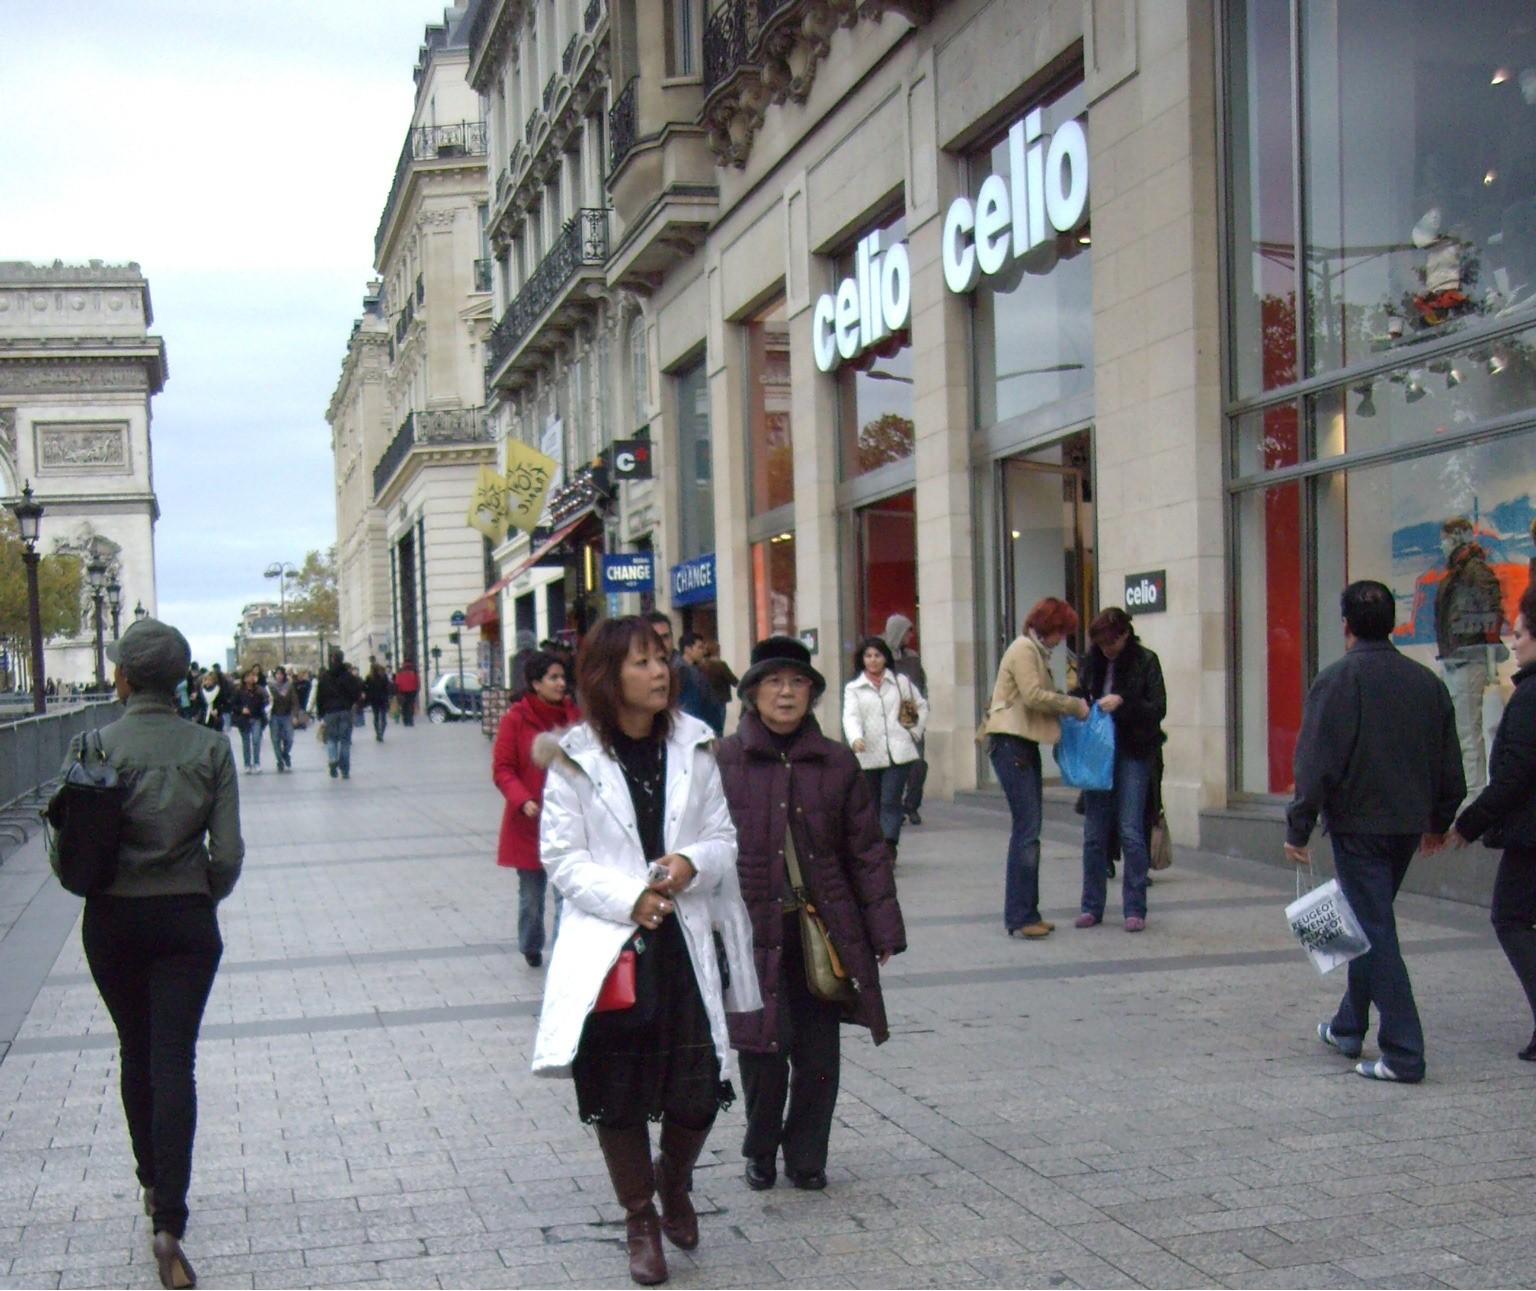 premium selection outlet store discount sale Celio (retailer) - Wikipedia